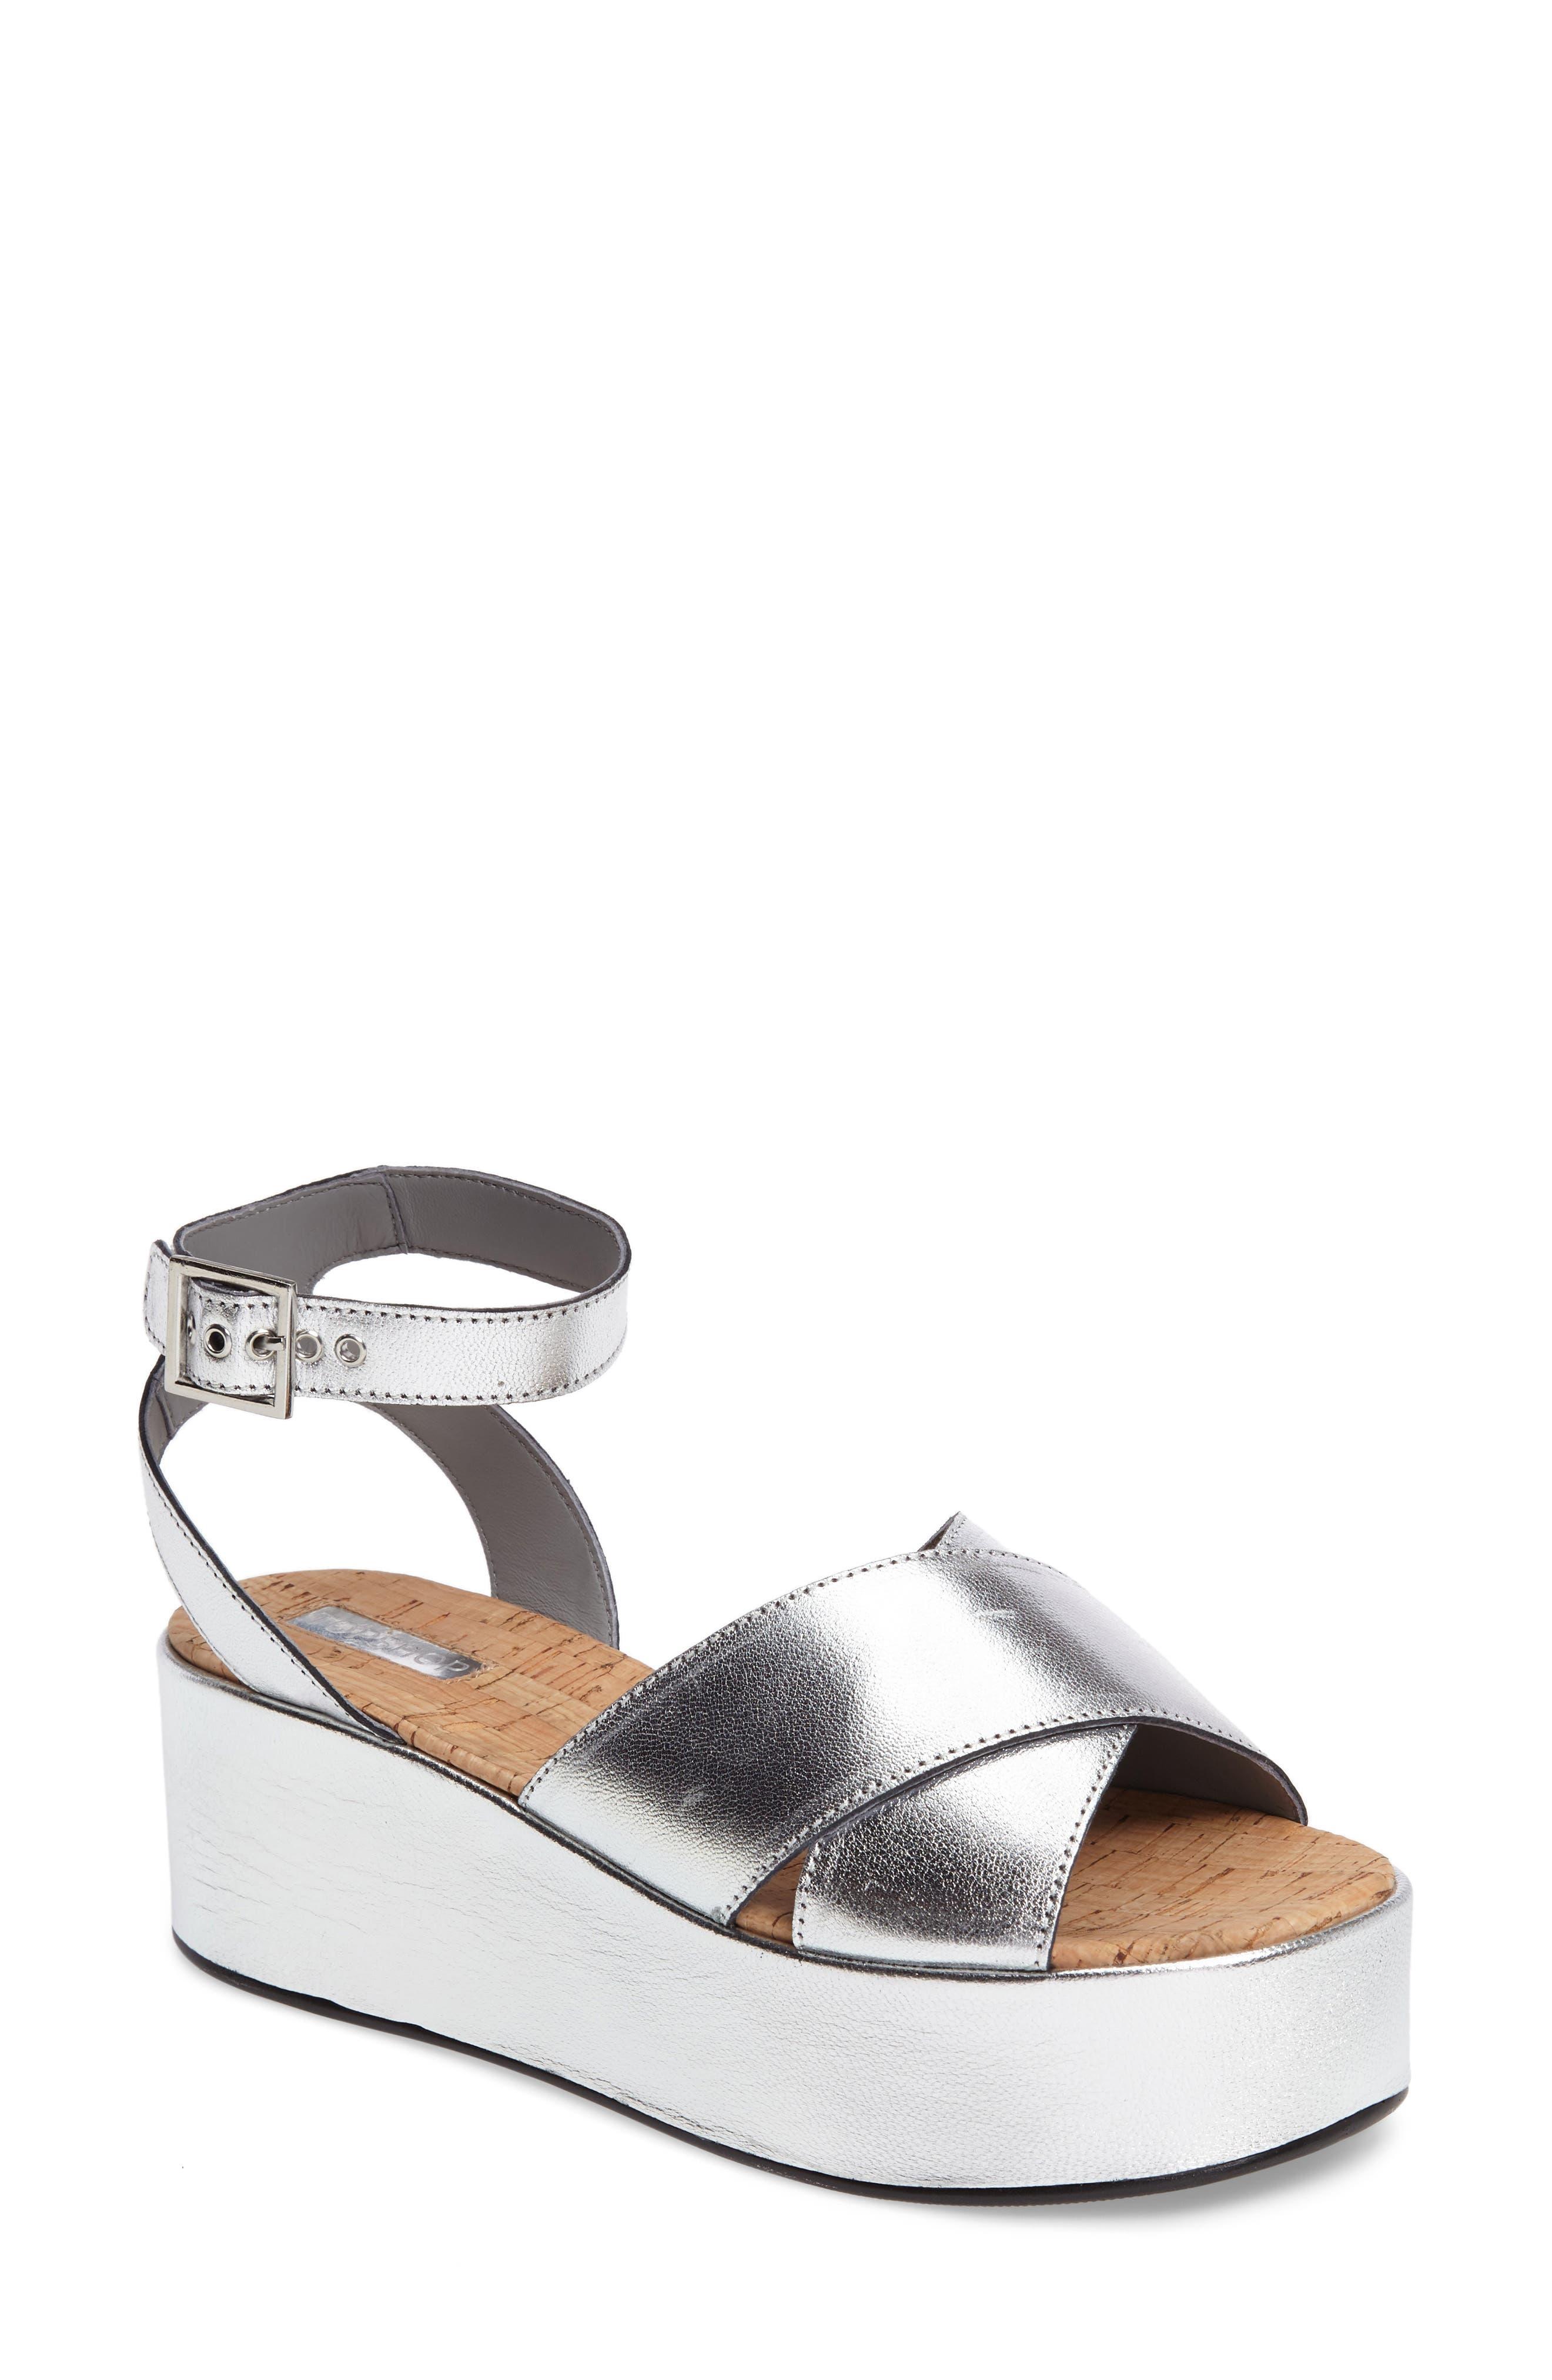 Alternate Image 1 Selected - Topshop Whisper Platform Sandal (Women)